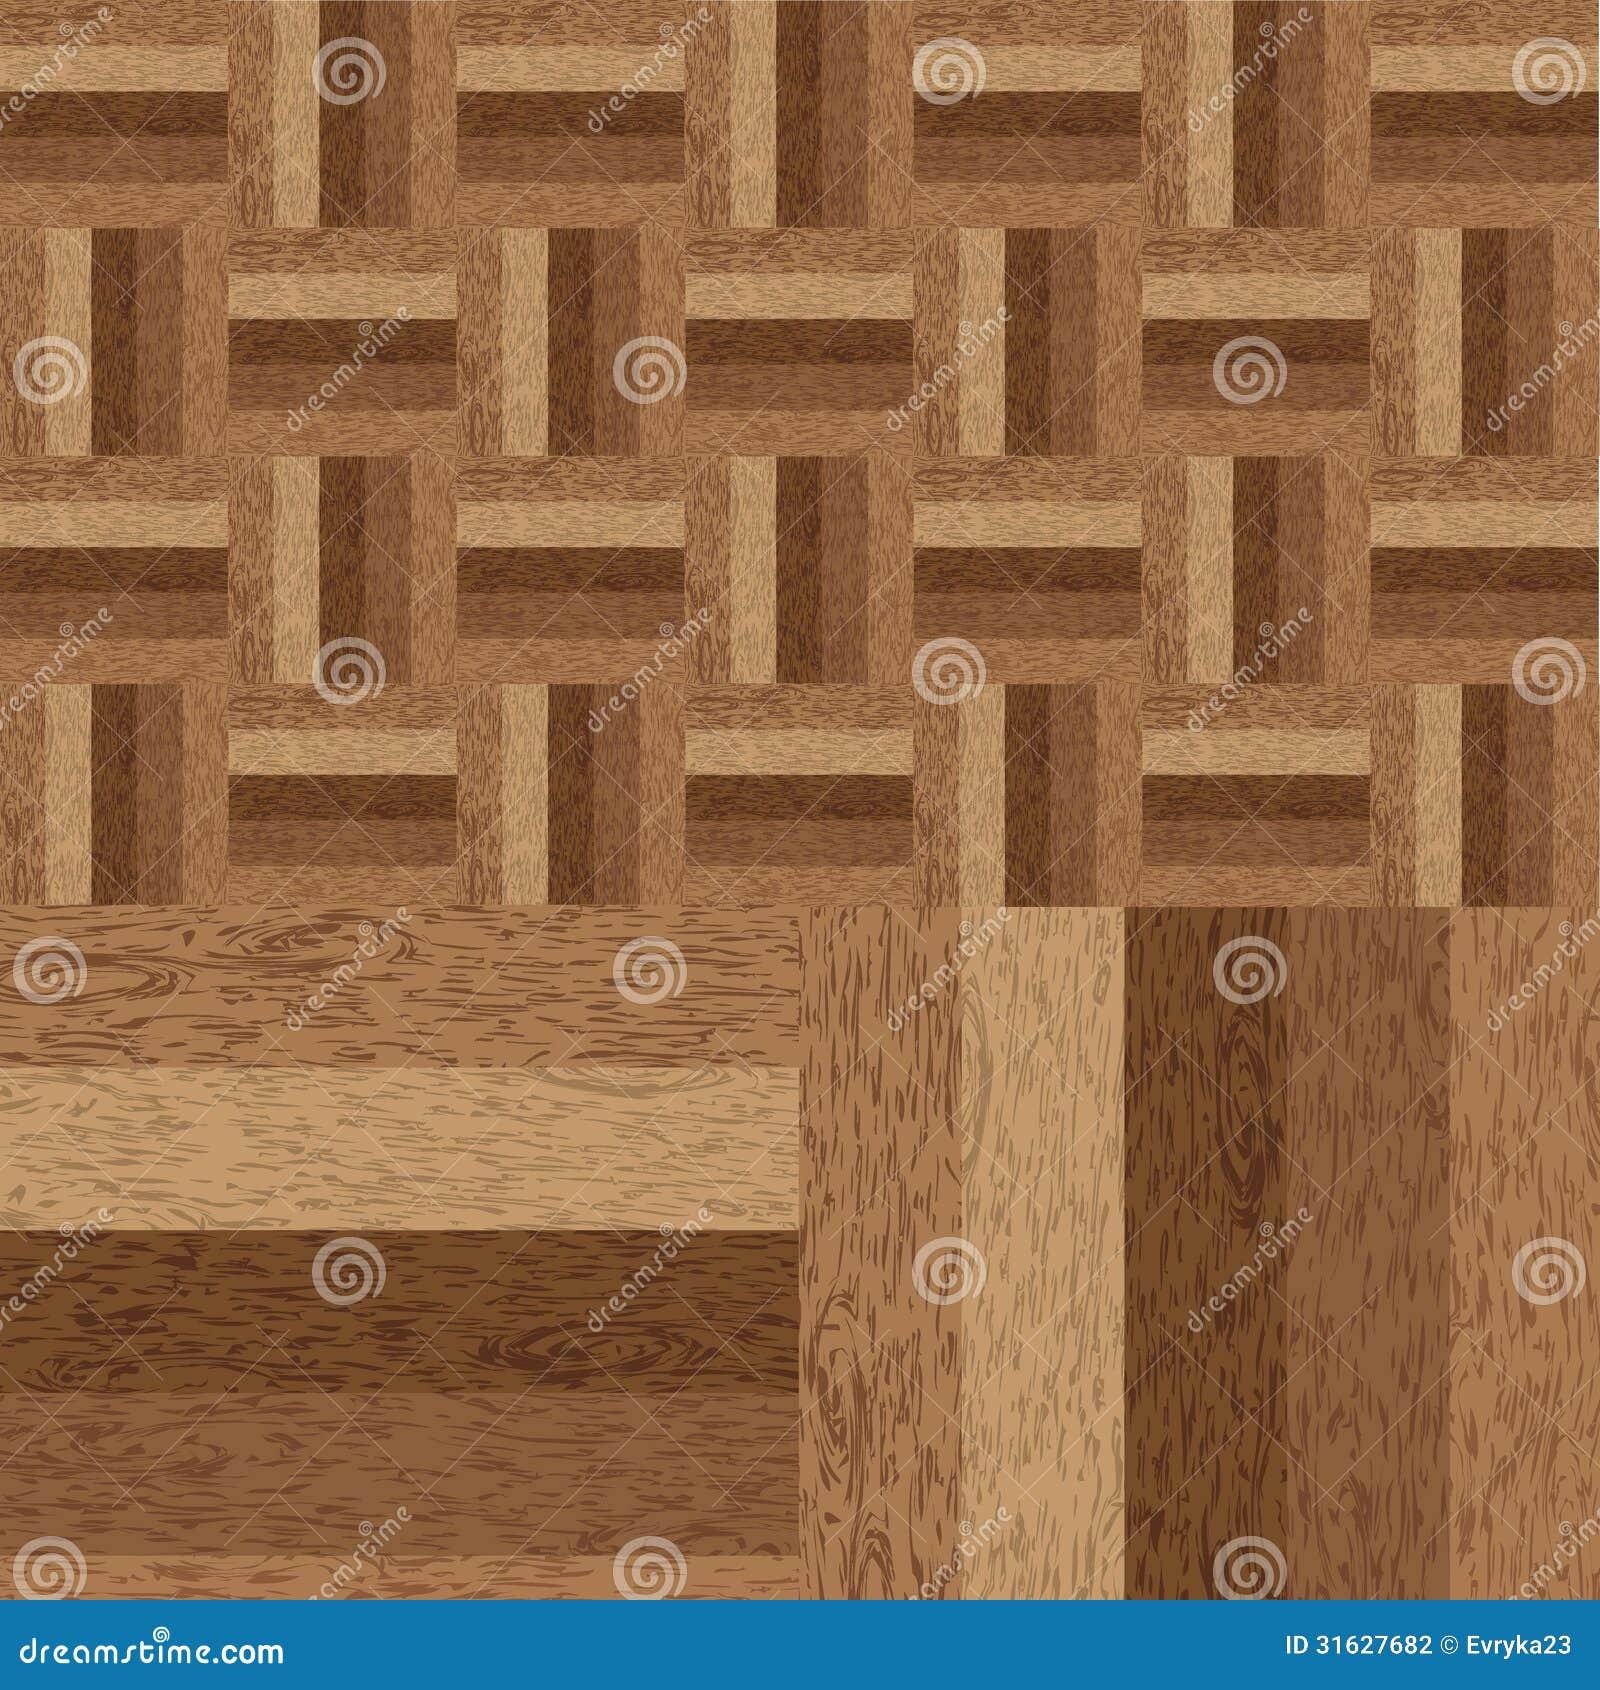 Laminate flooring on uneven floors also laminate flooring and flooring